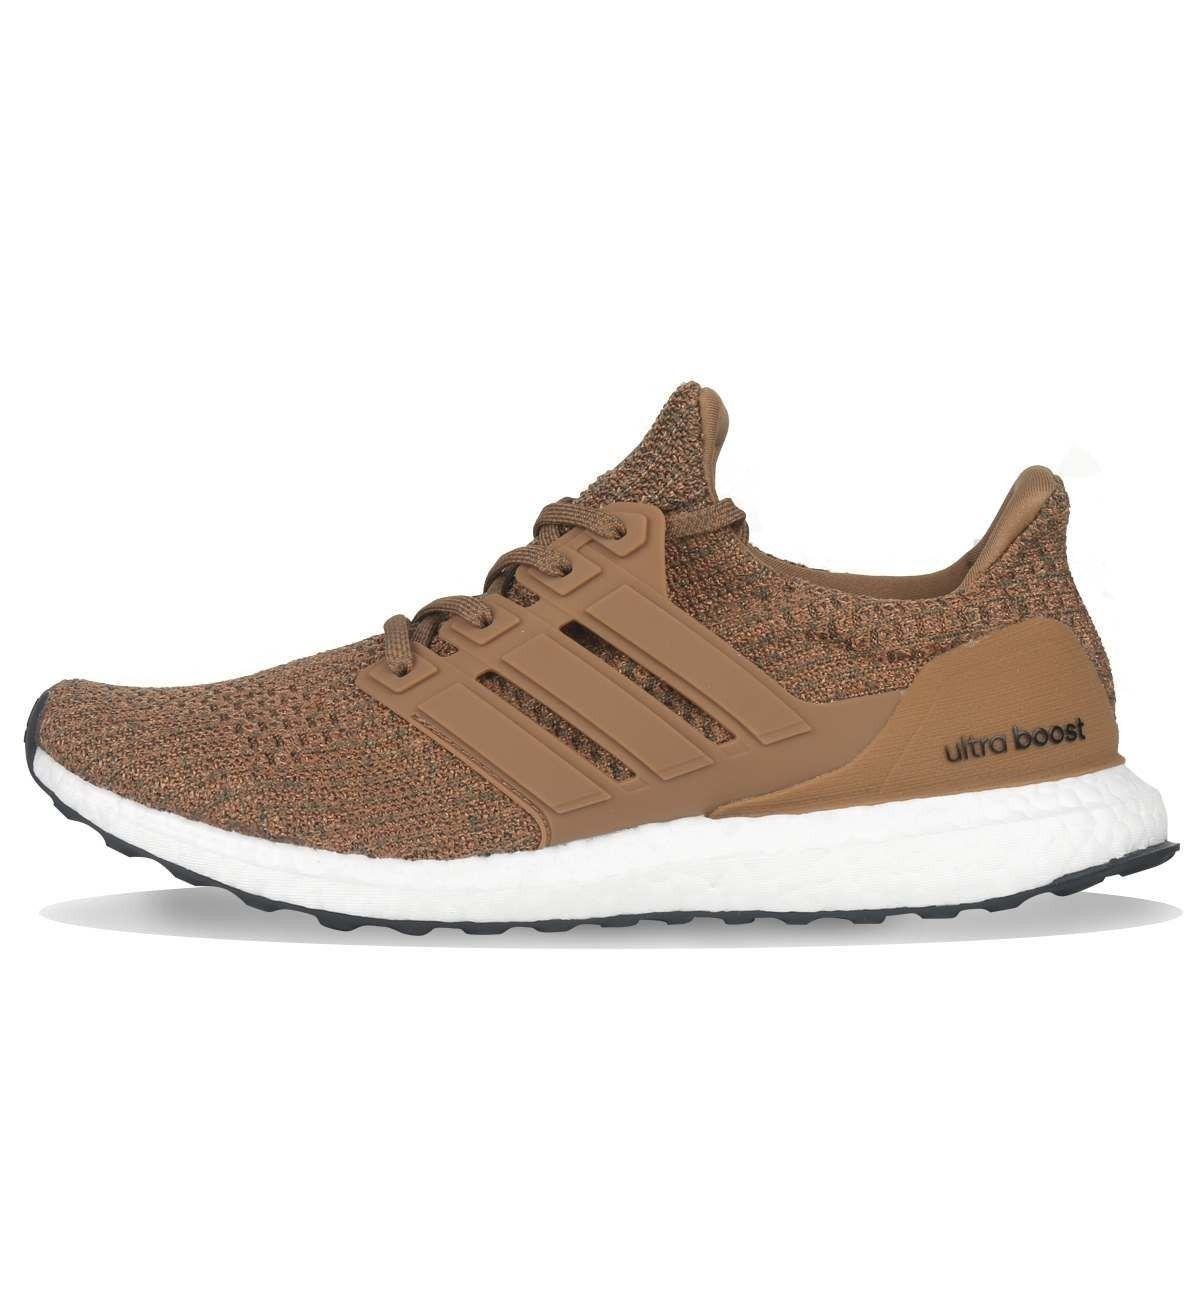 Adidas UltraBoost Raw Desert £67.99 @ 5 Pointz